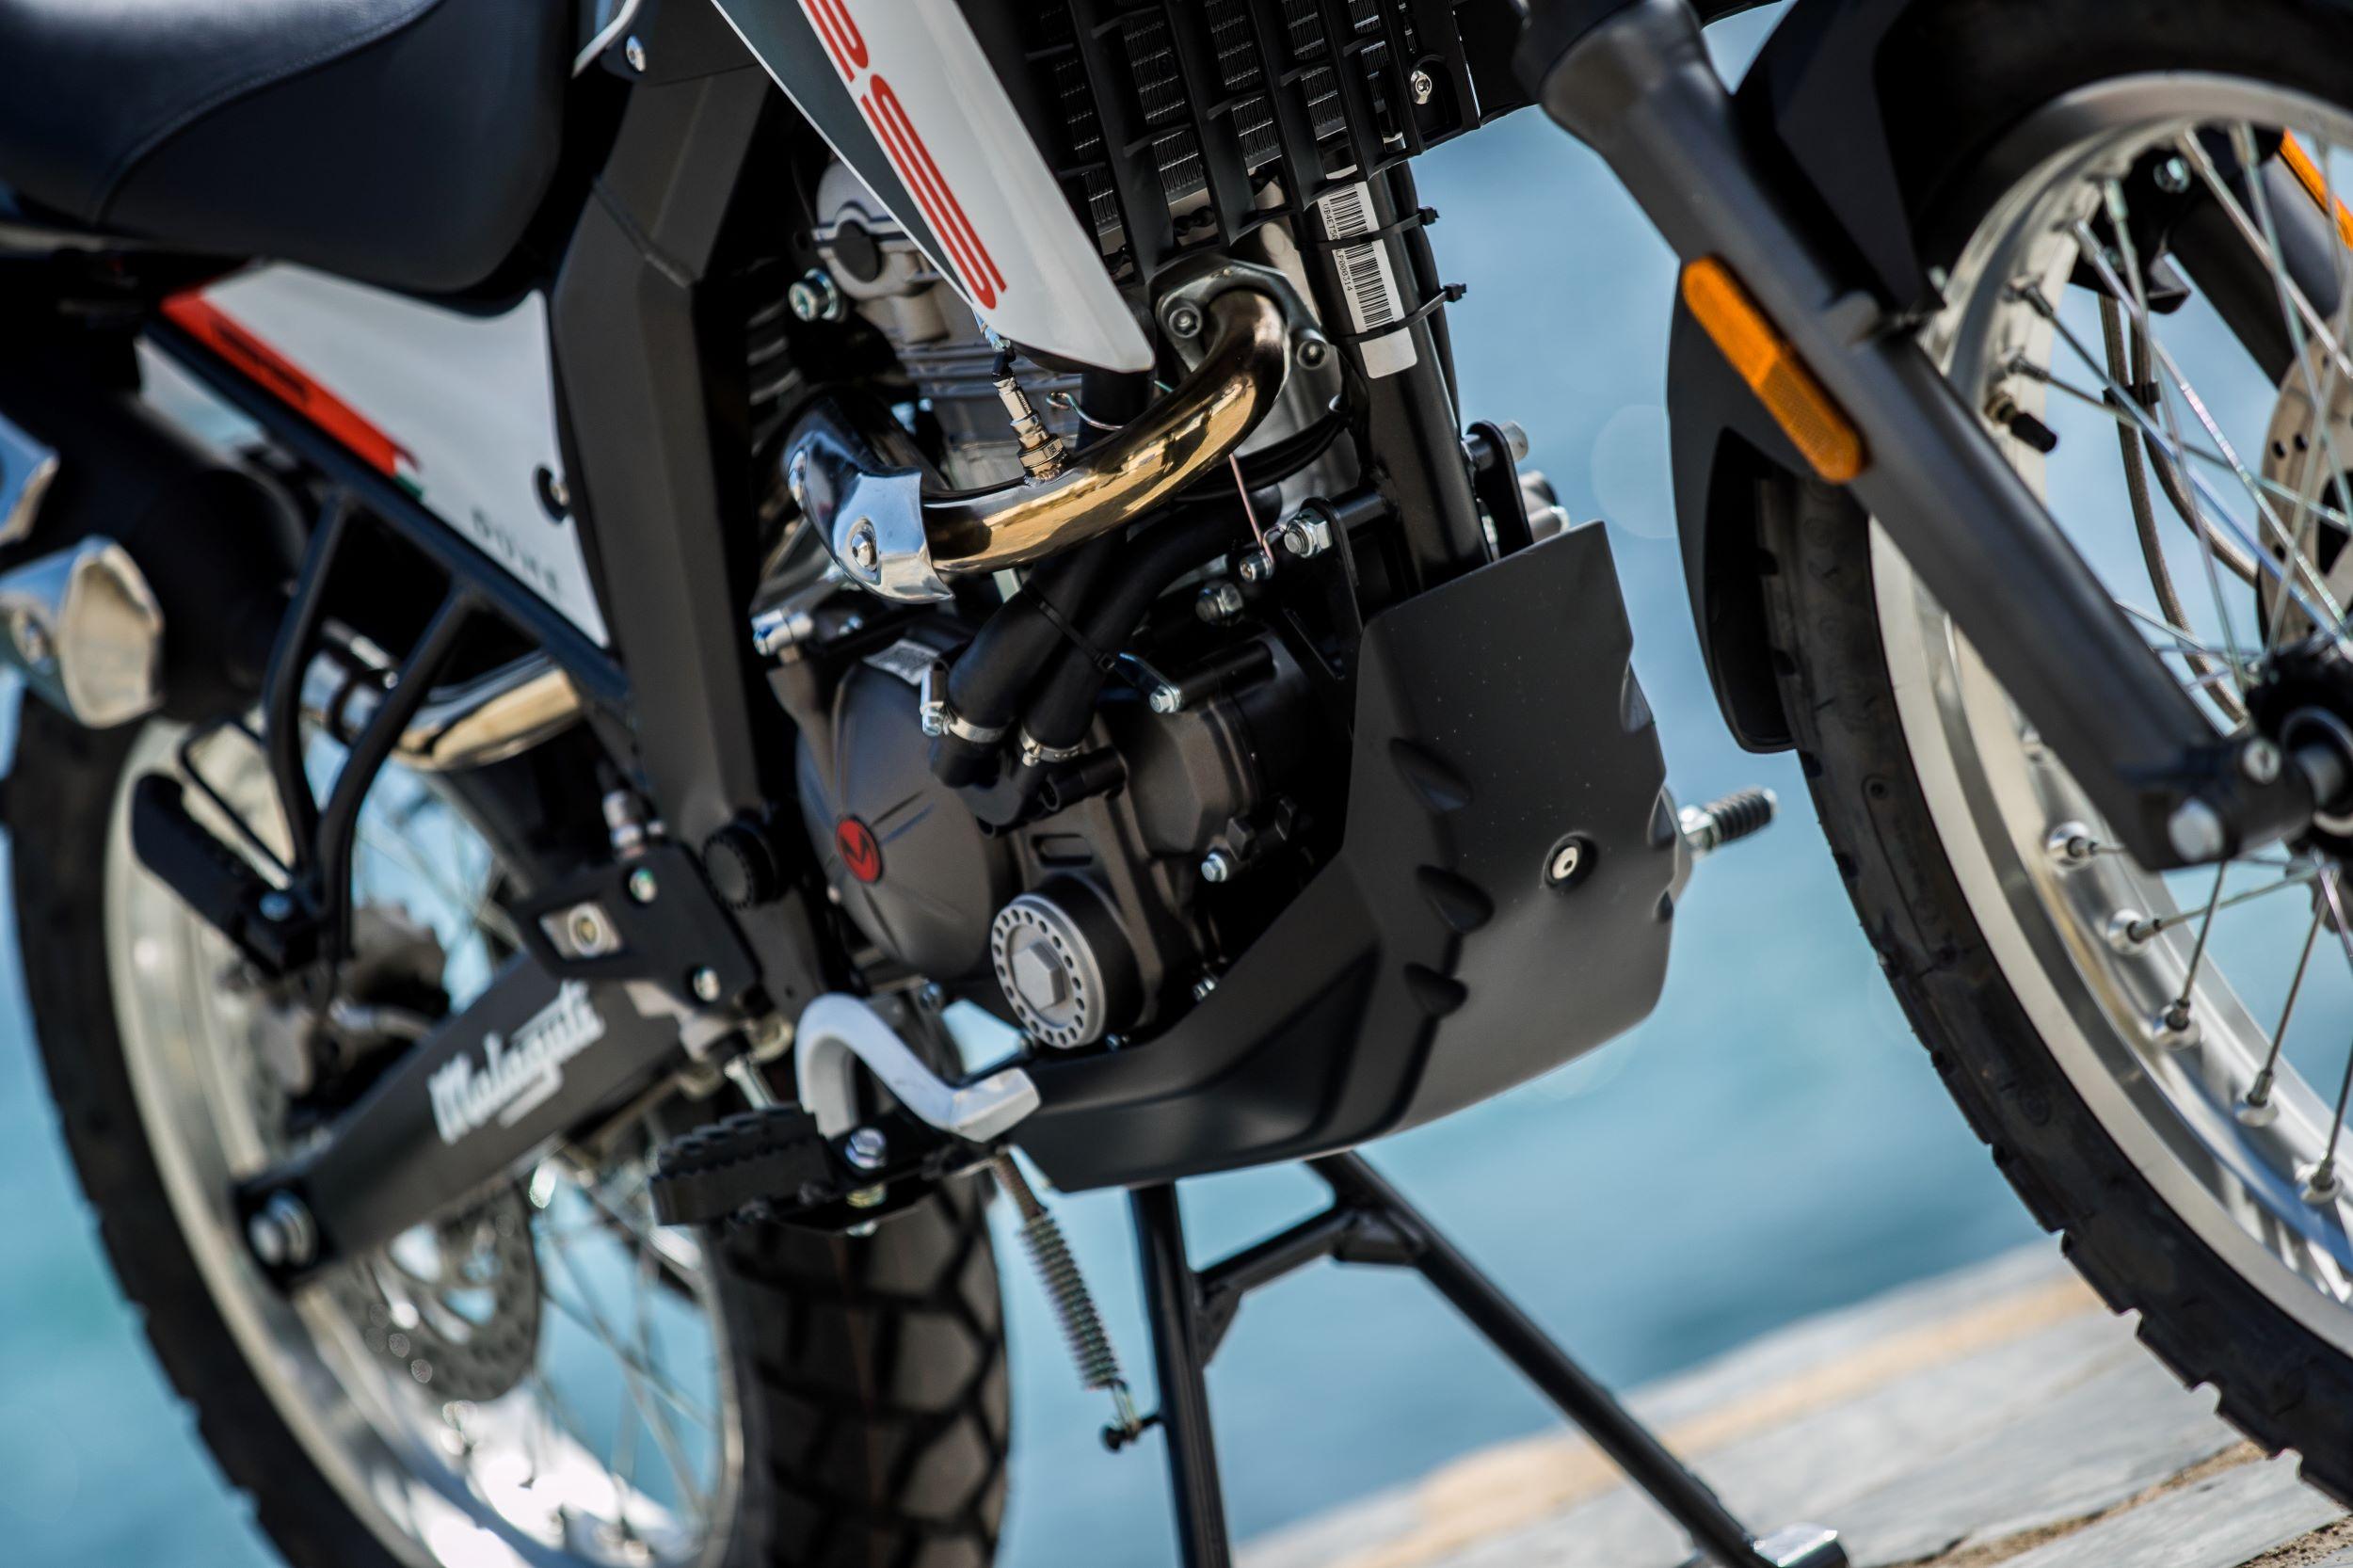 https://malaguti.bike/wp-content/uploads/sites/3/2021/08/dune-staender-detail.jpg